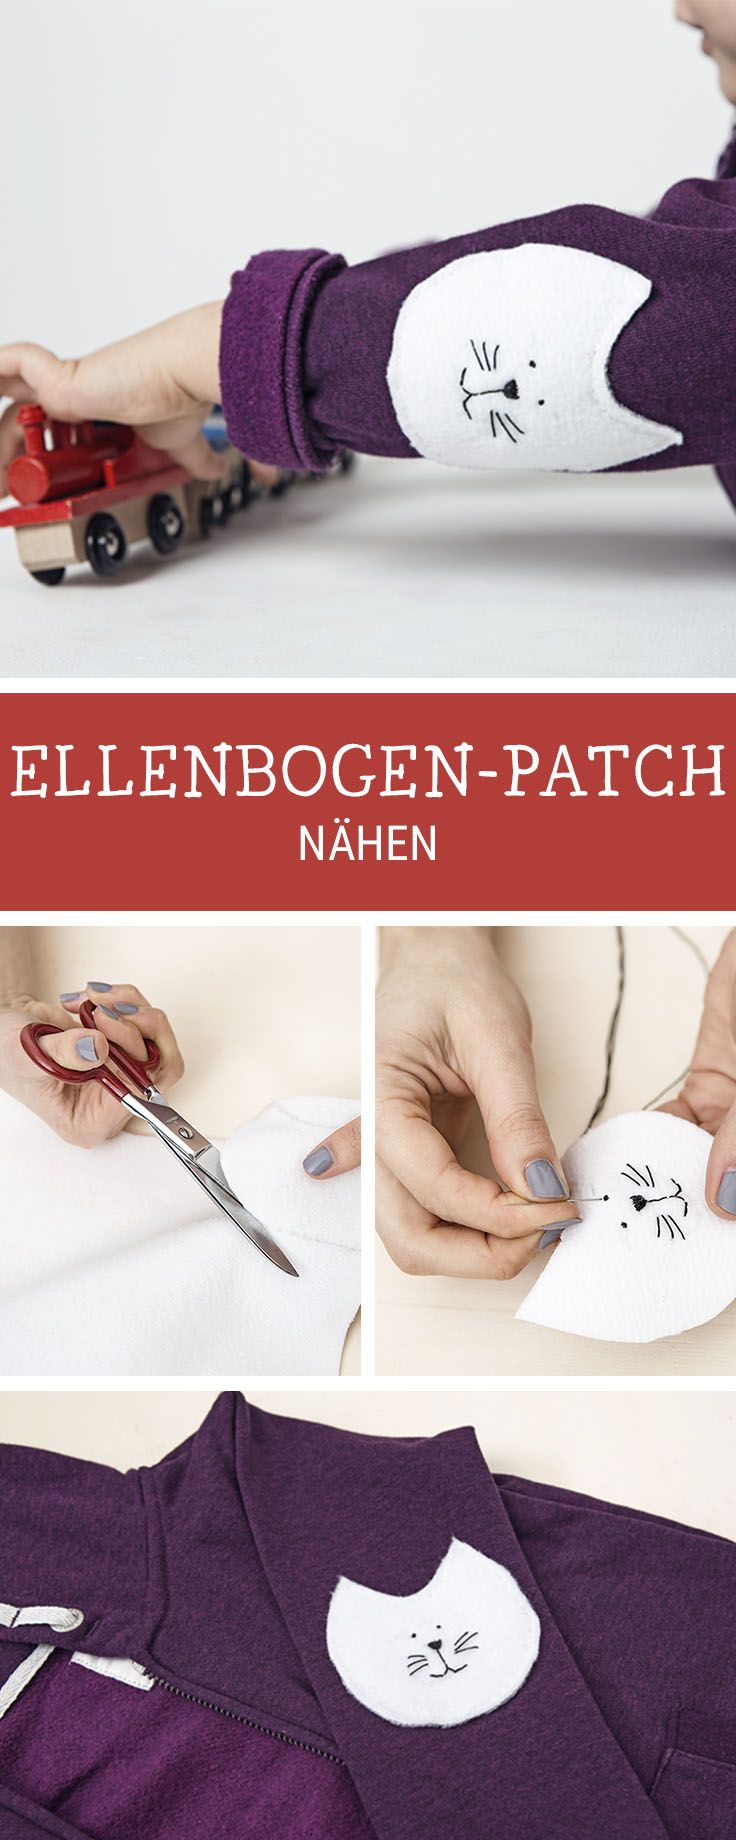 Nähanleitung für Flicken in Katzenform, Nähidee / diy sewing inspiration for cute elbow patches in shape of cats via DaWanda.com